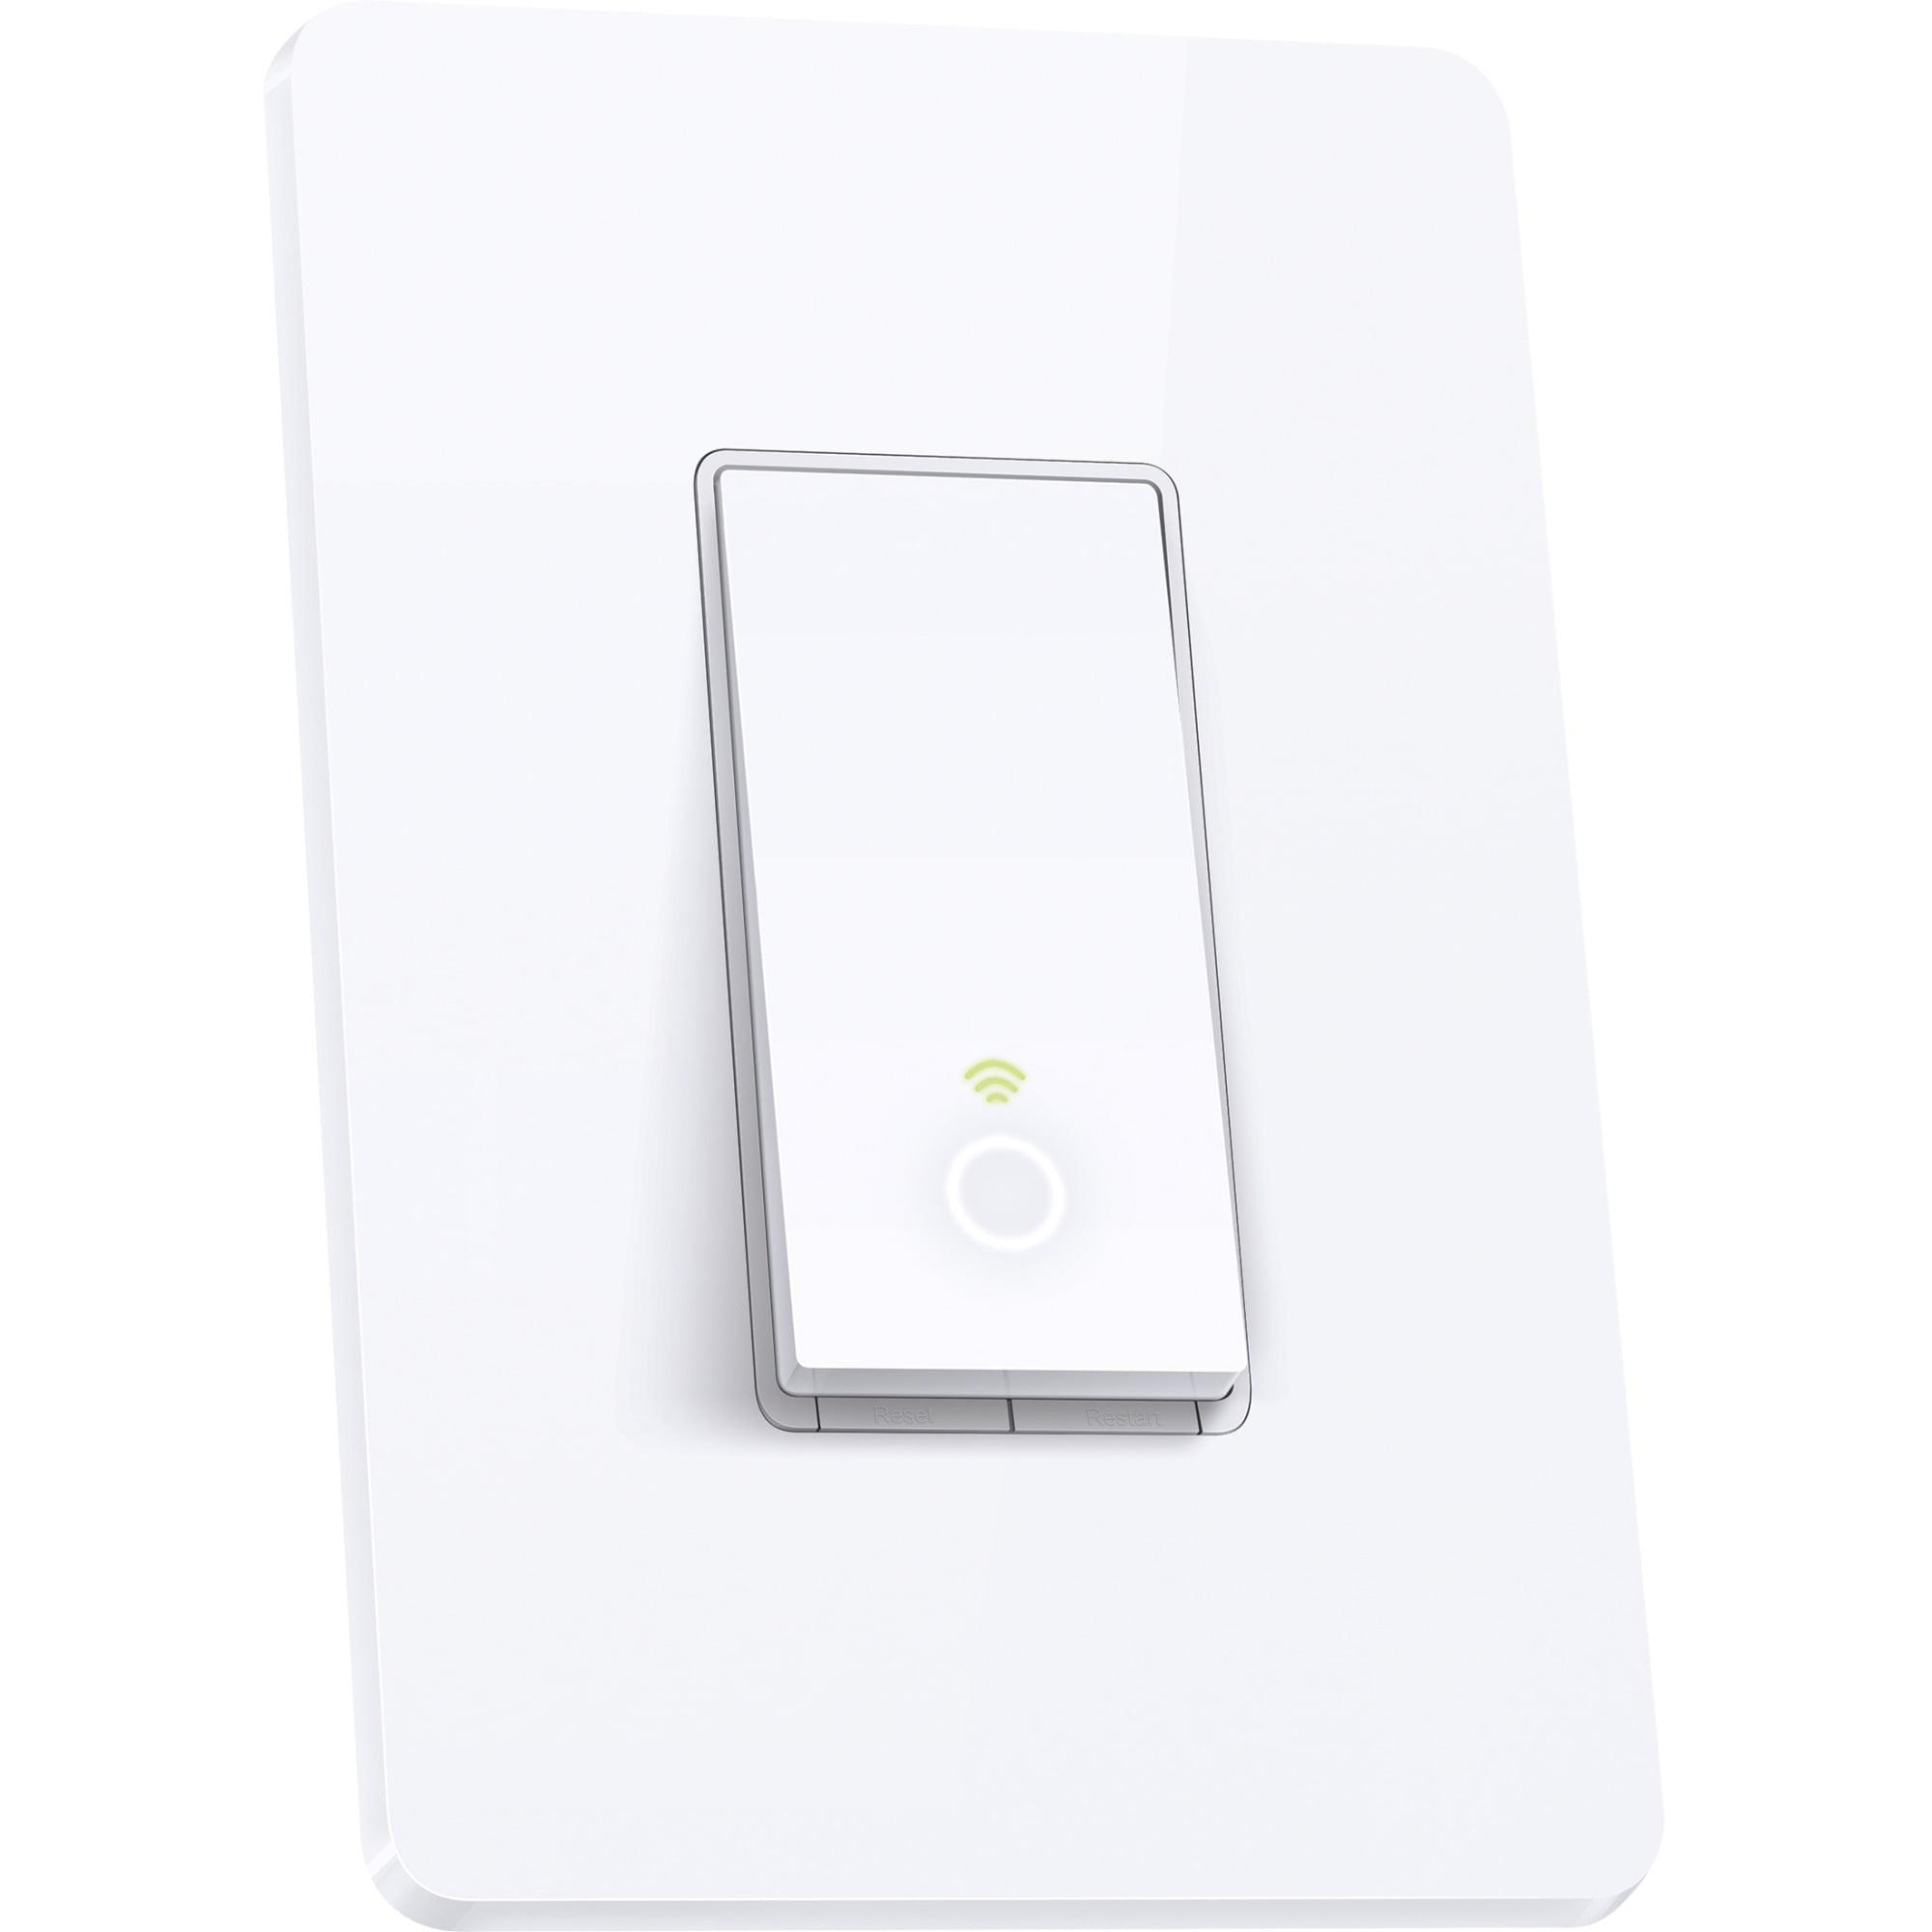 TP-LINK Smart Wi-Fi Light Switch (hs200)